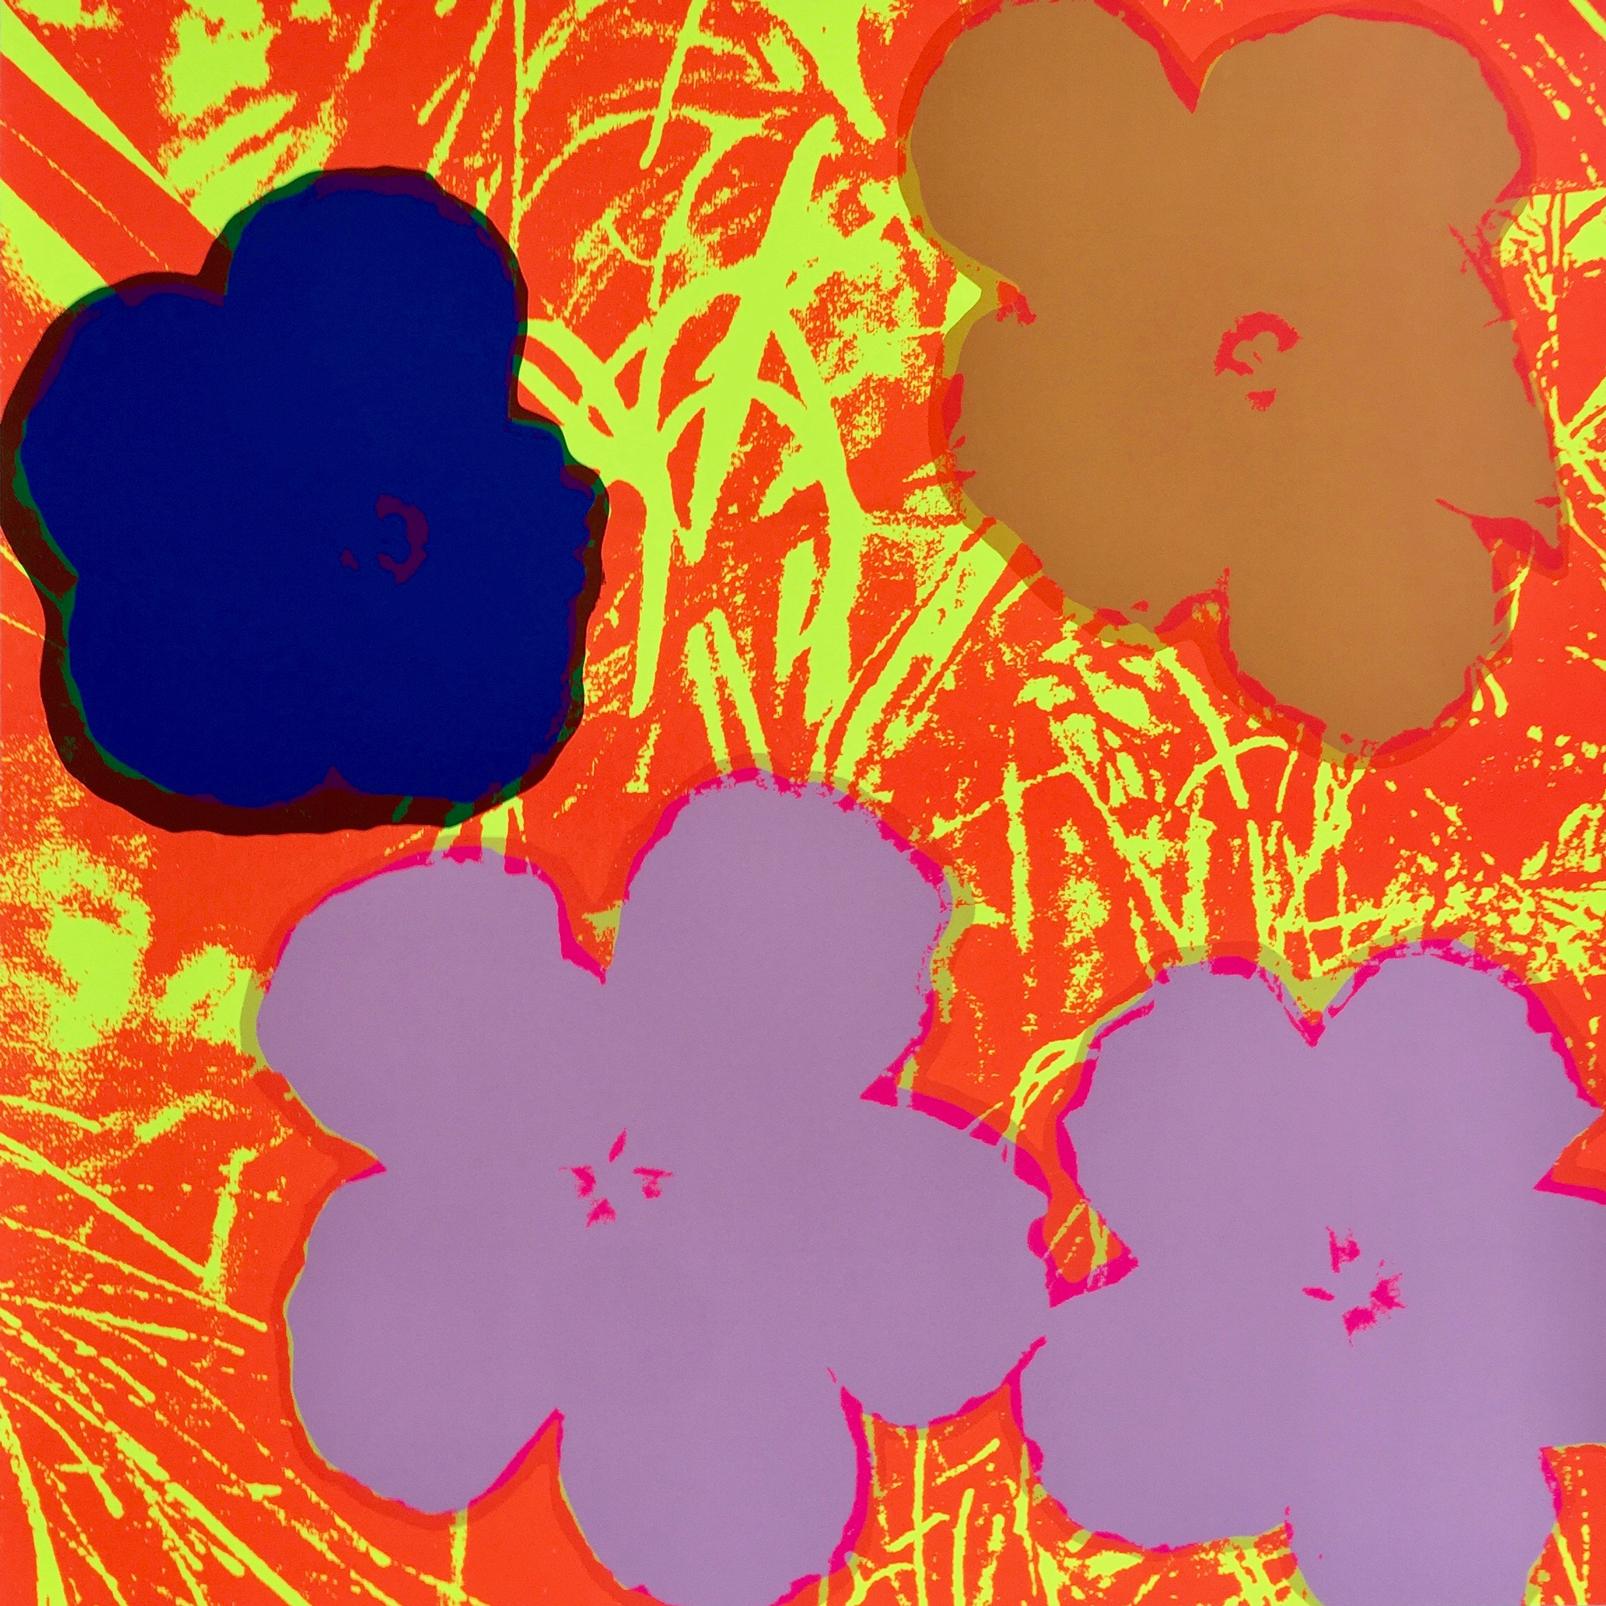 11.69: Flowers